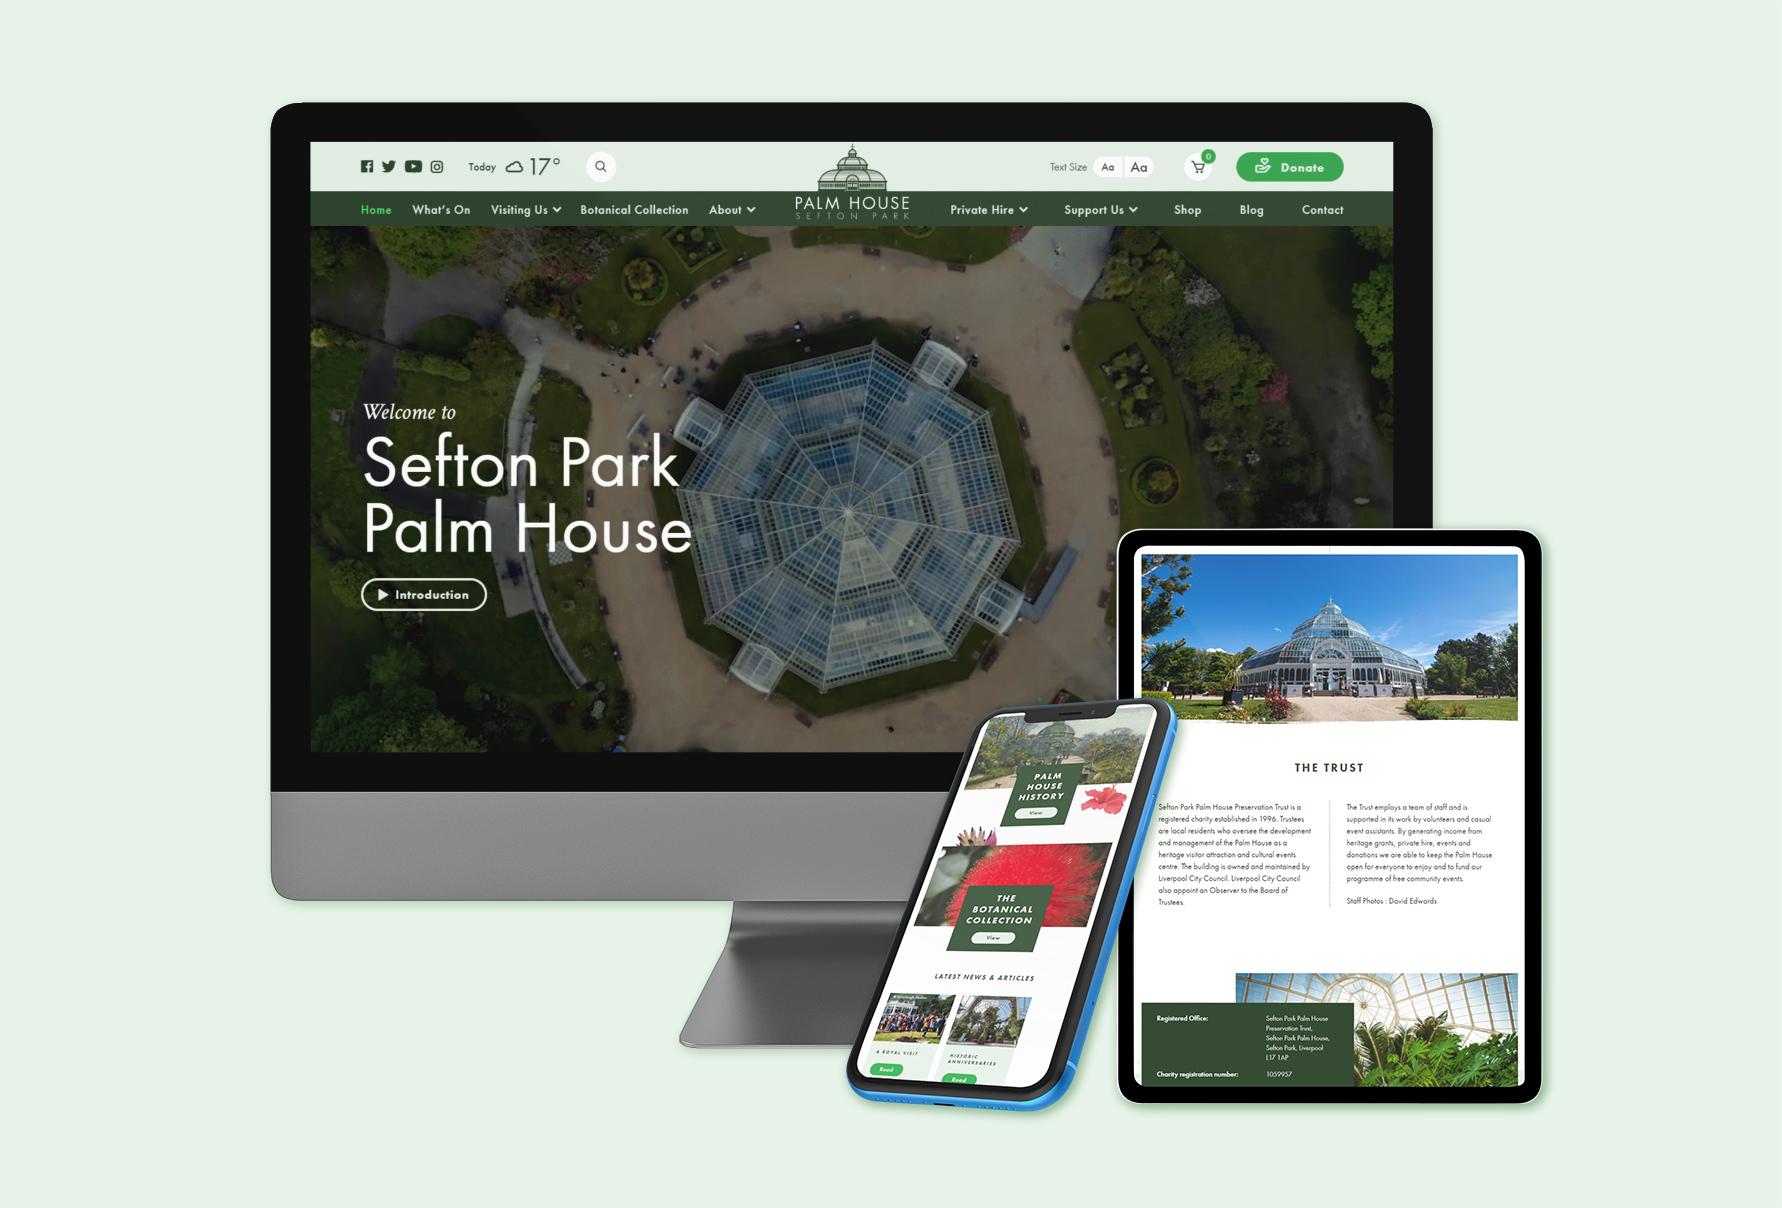 Sefton Park Press Release Pic